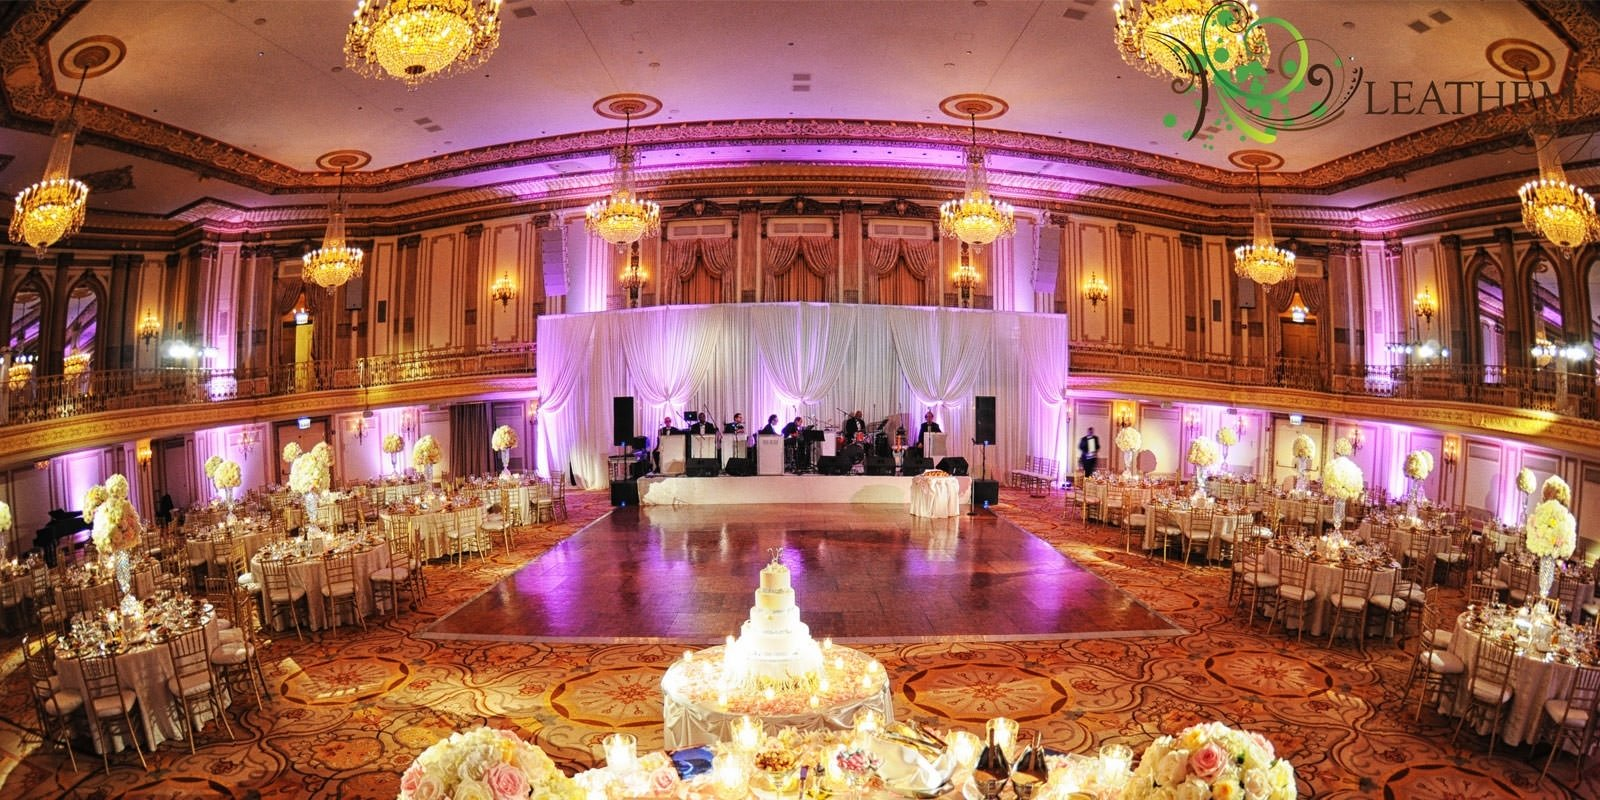 10 Pretty Fun Wedding Ideas On A Budget download unique wedding ideas for reception decorations 50th 2020